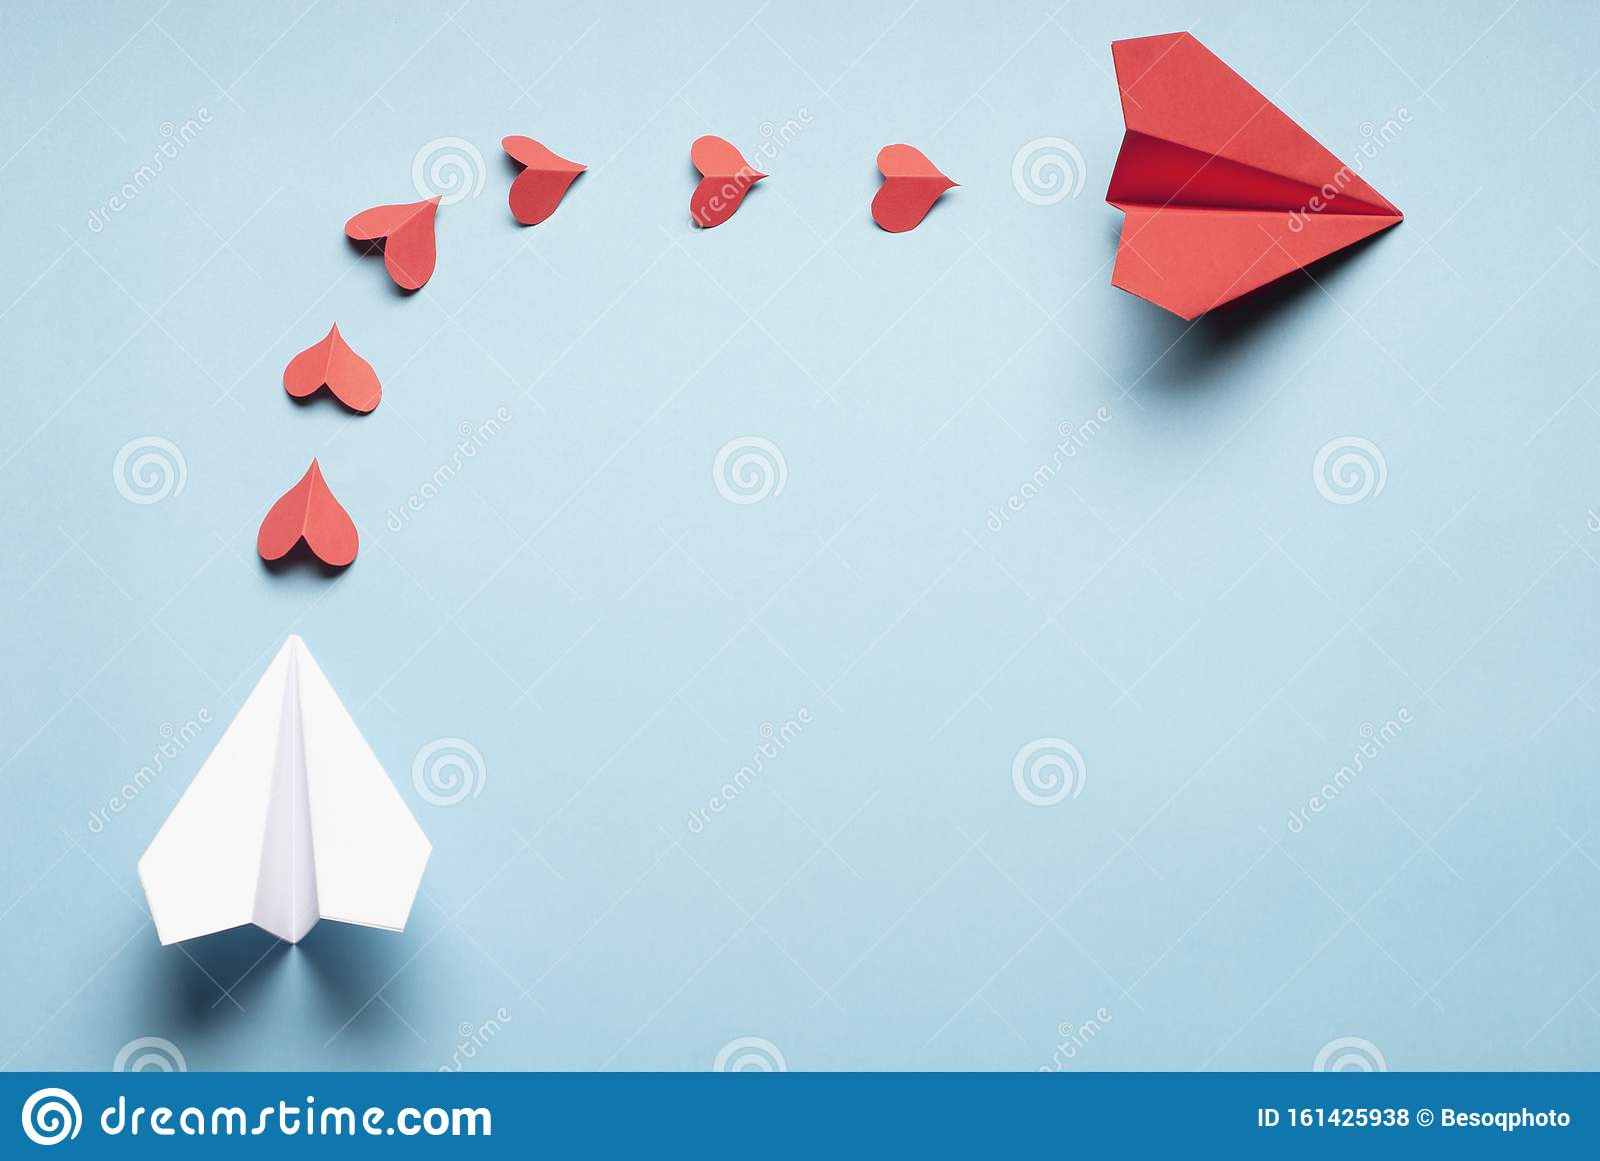 Japanese Origami Paper Cranes Set Orange Red White Pink Symbol Of ... | 1160x1600